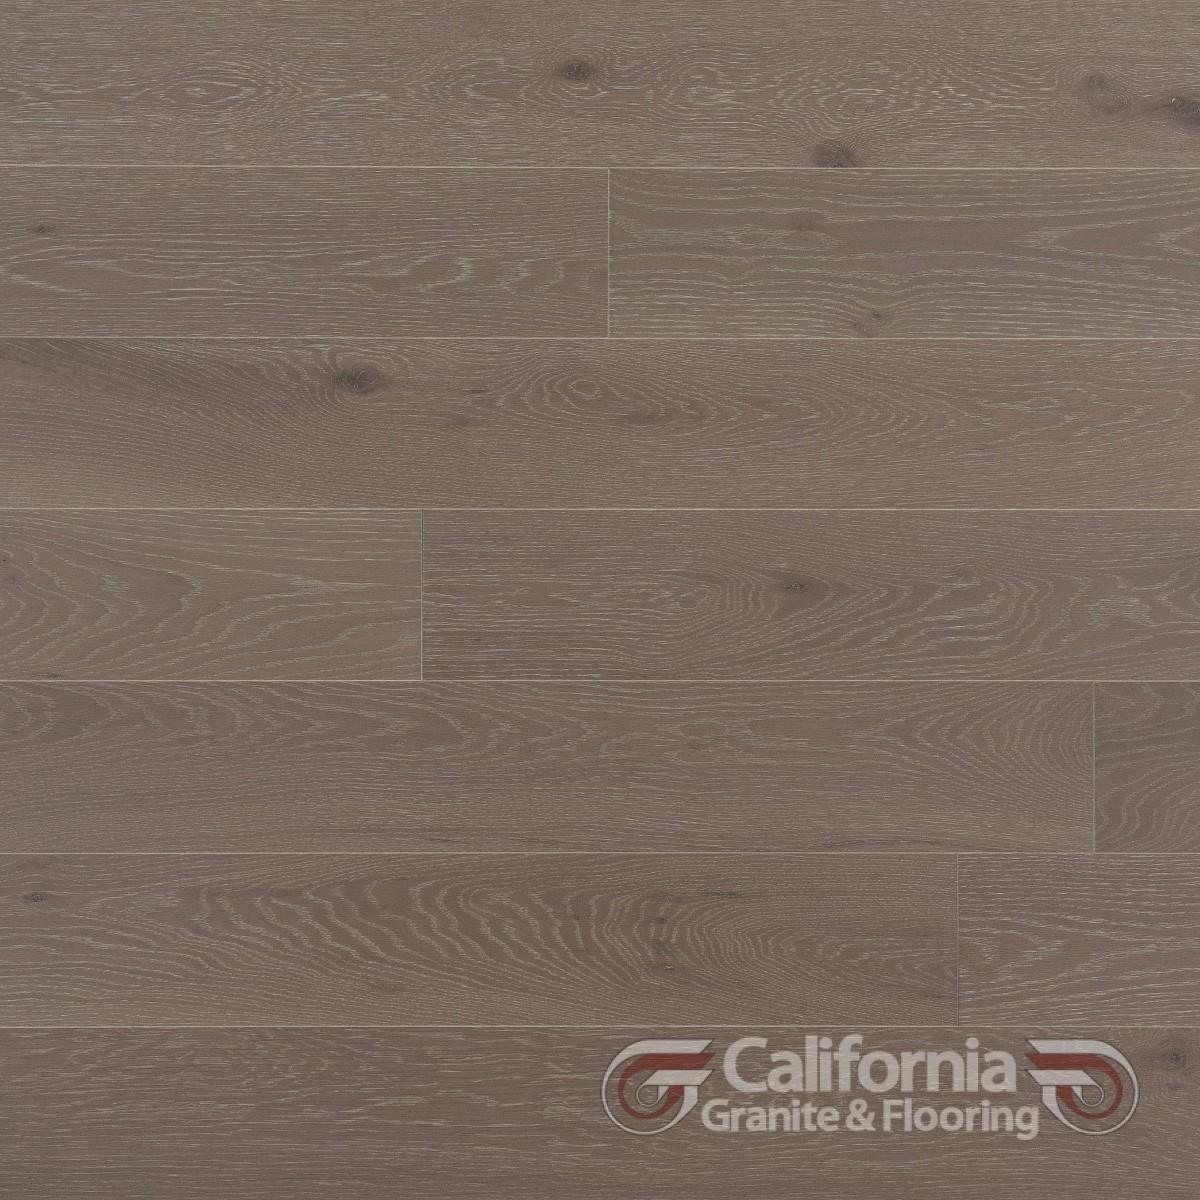 hardwood-flooring-white-oak-roller-coaster-character-brushed-herringbone-2